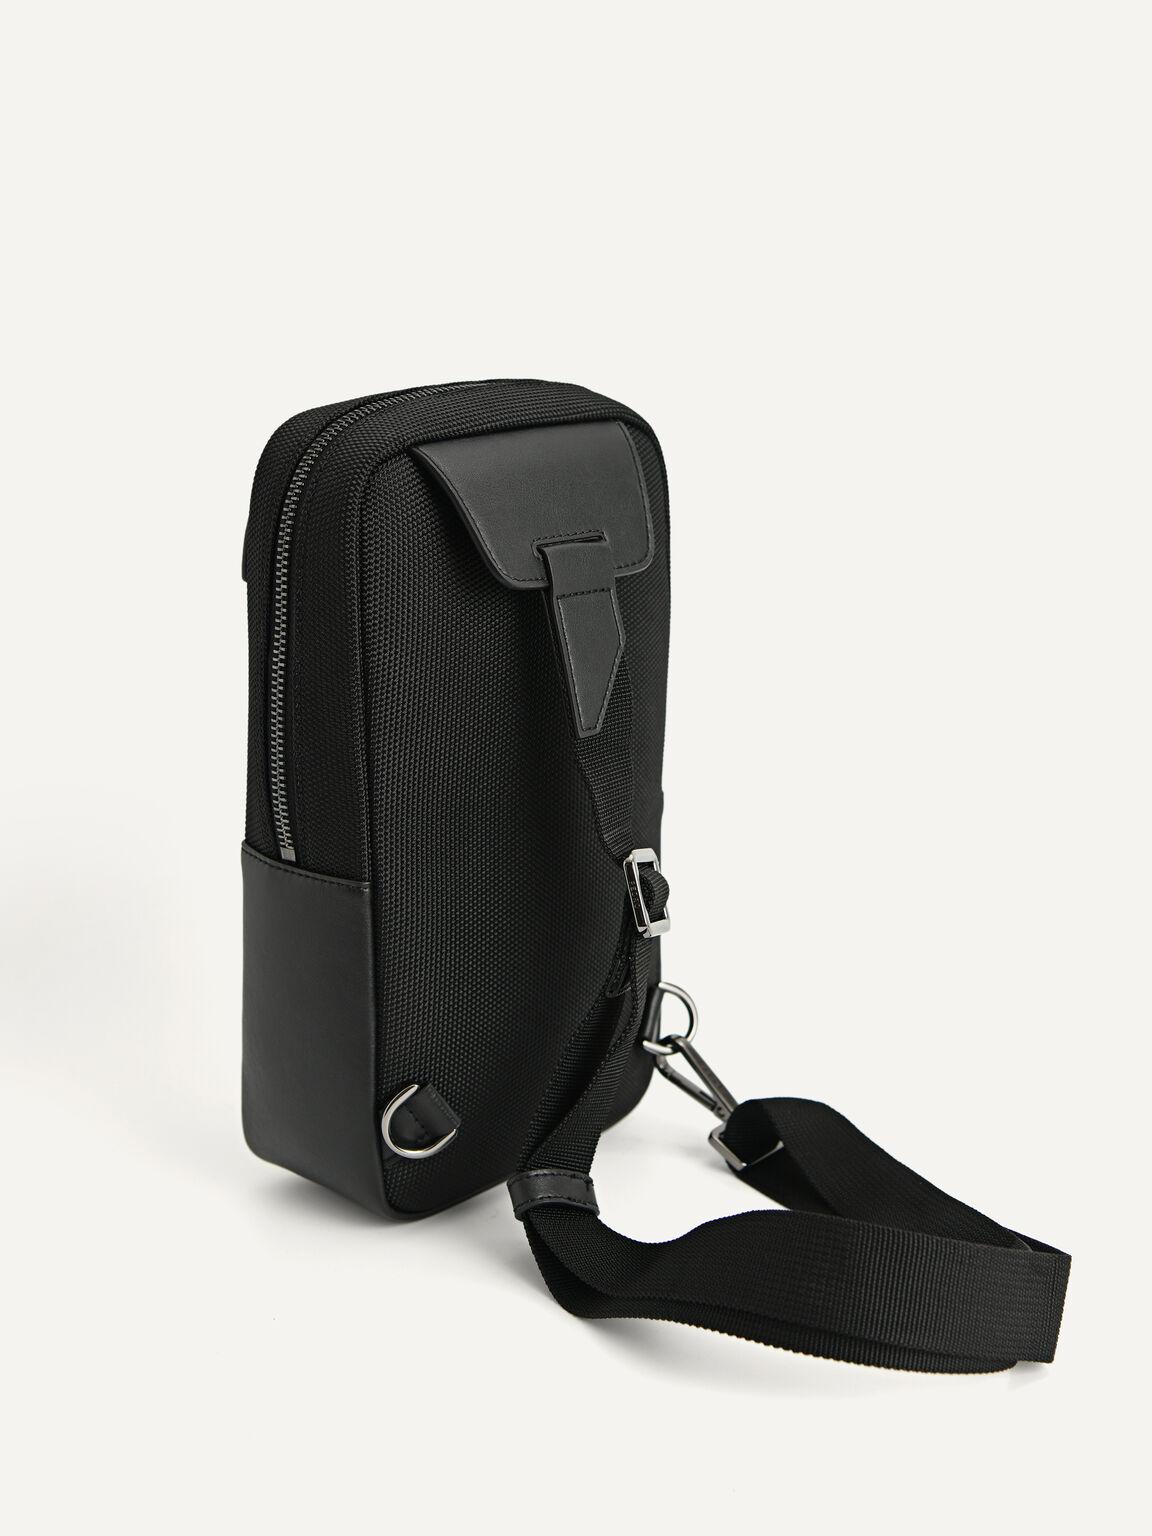 Utilitarian Sling Pouch, Black, hi-res